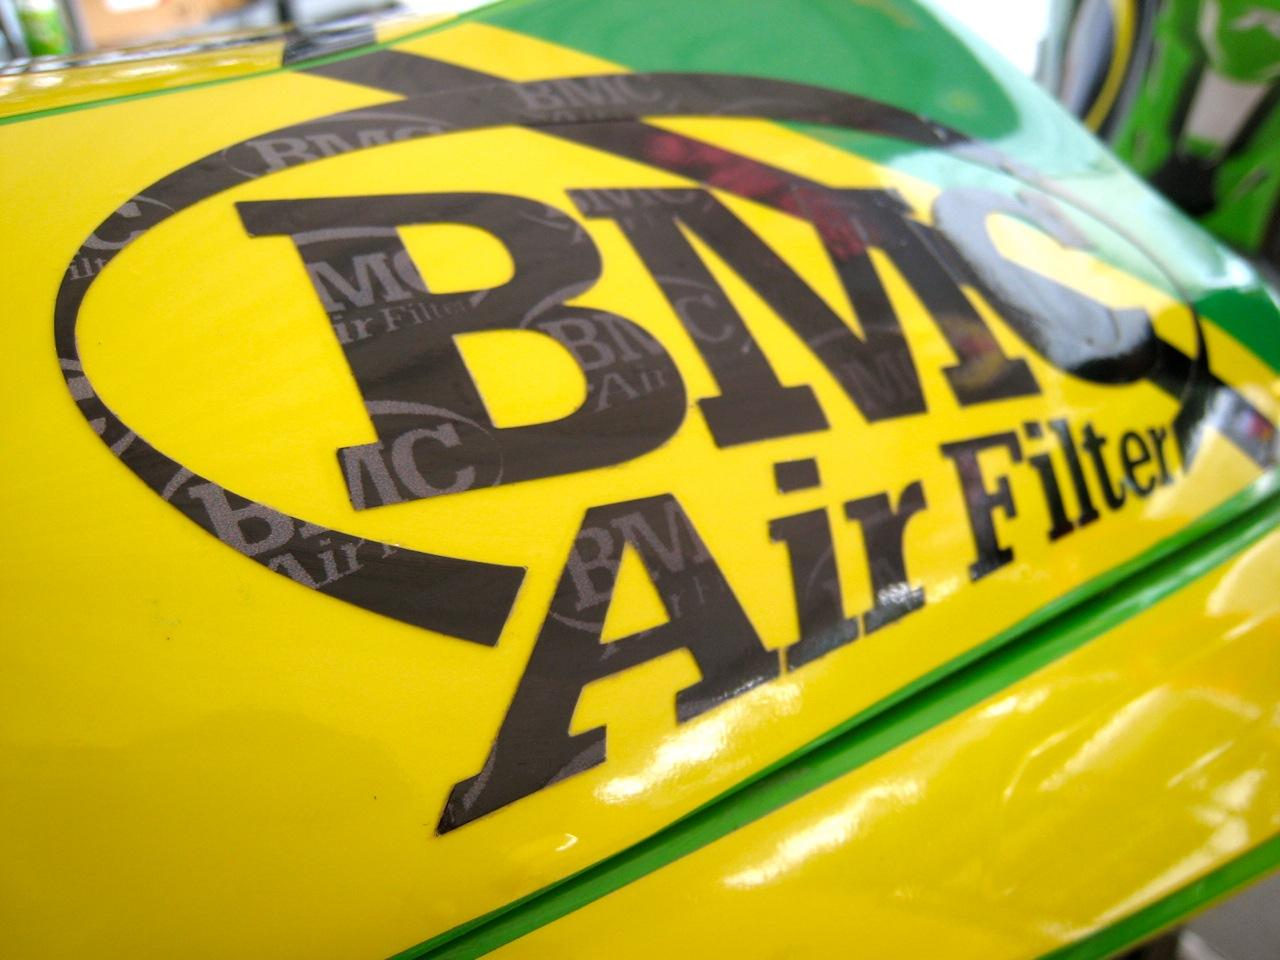 BMC Air Filter Vinyl Sponsor